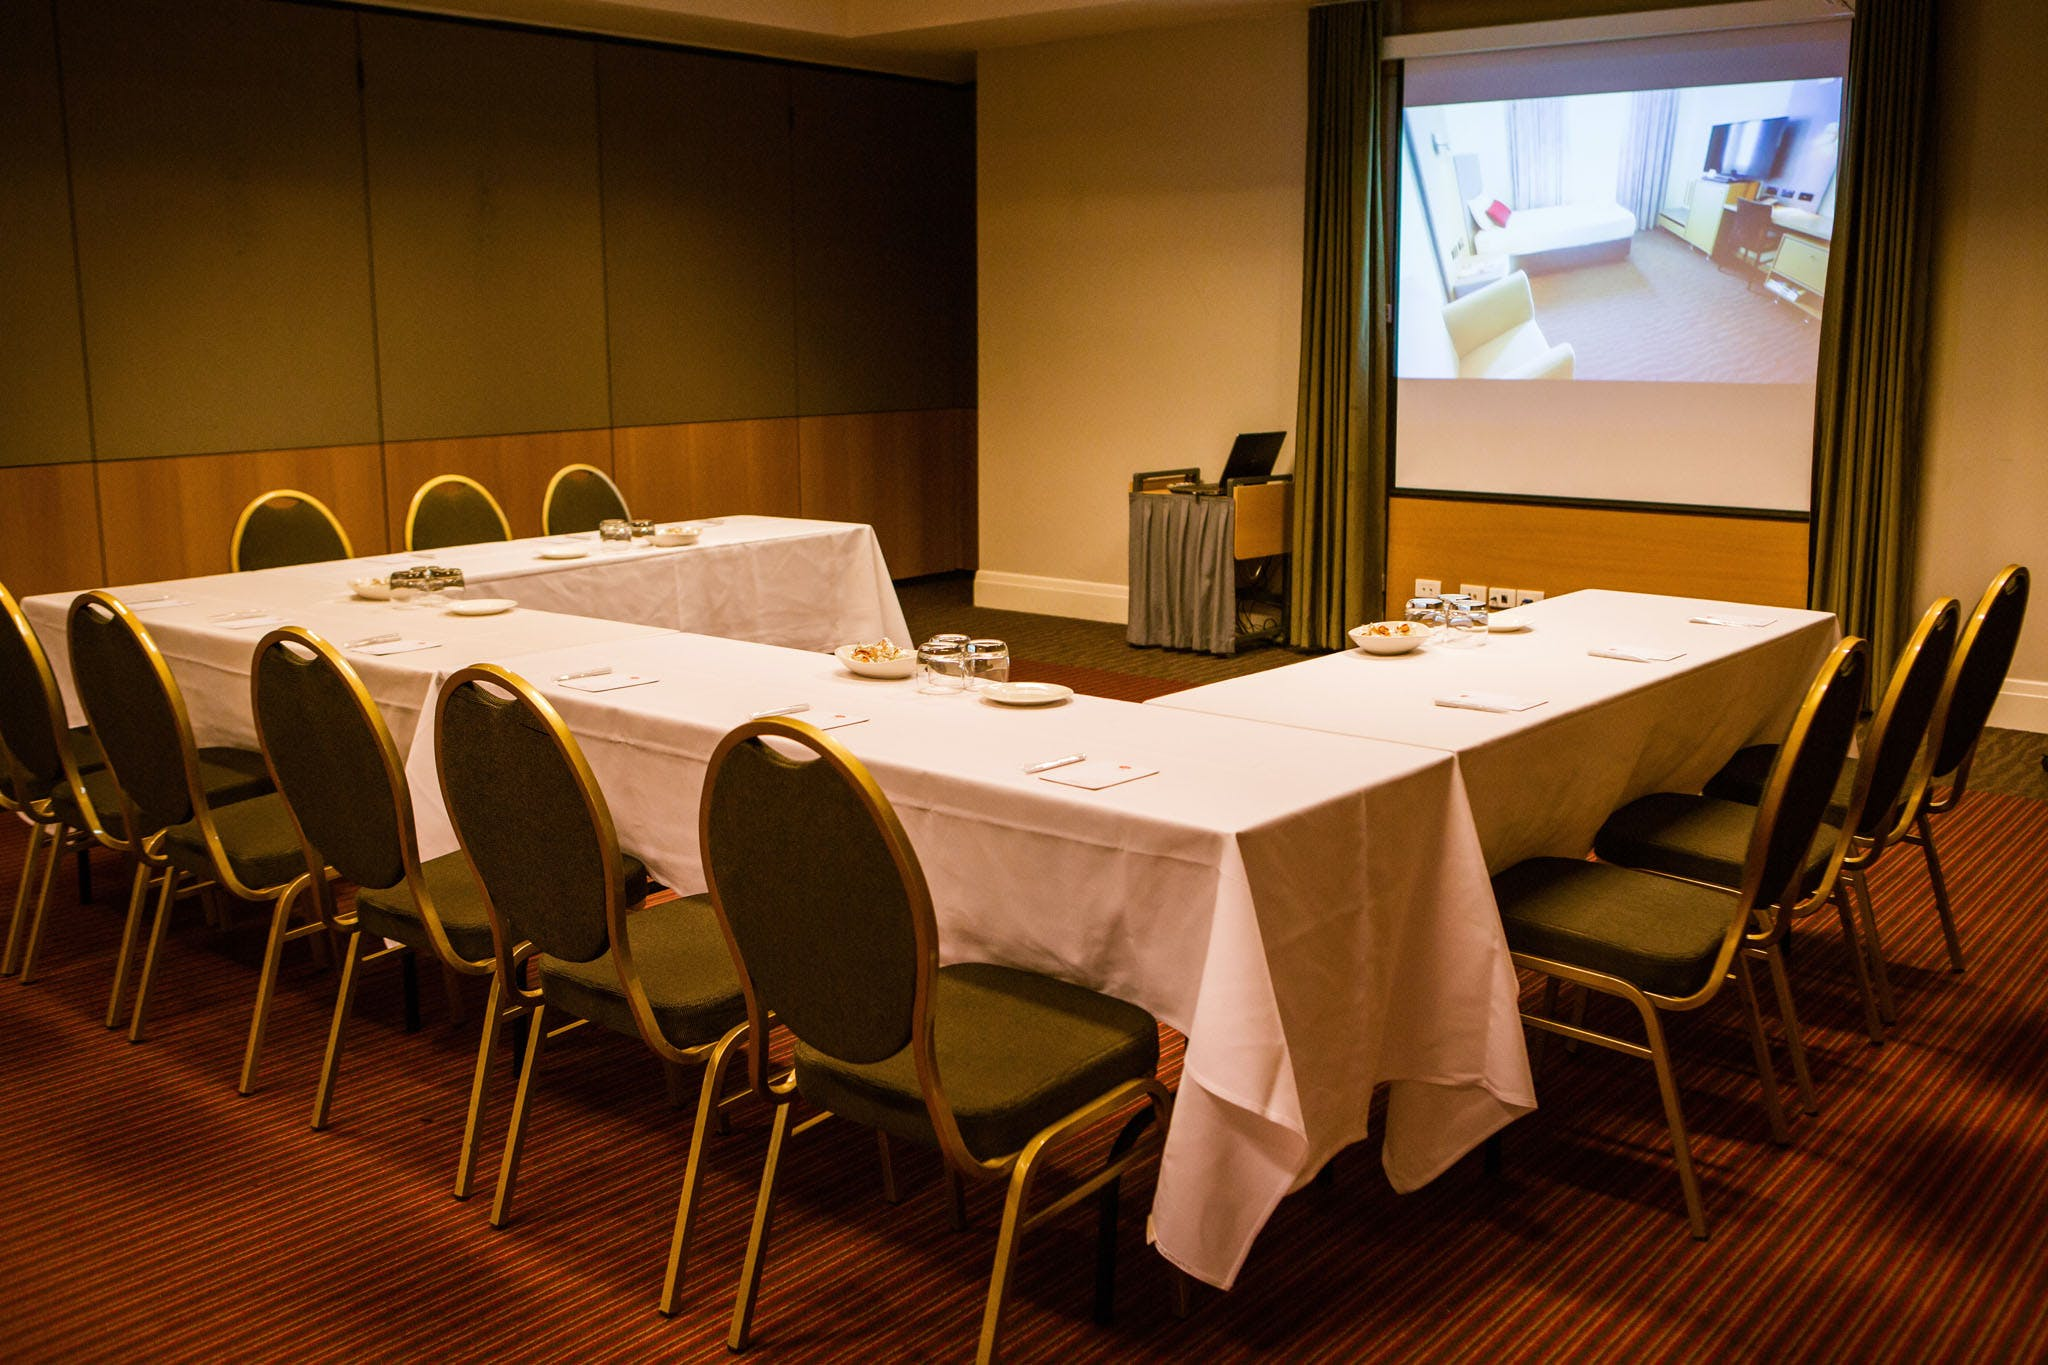 Amberley Room, meeting room at Metro Hotel Ipswich International, image 1